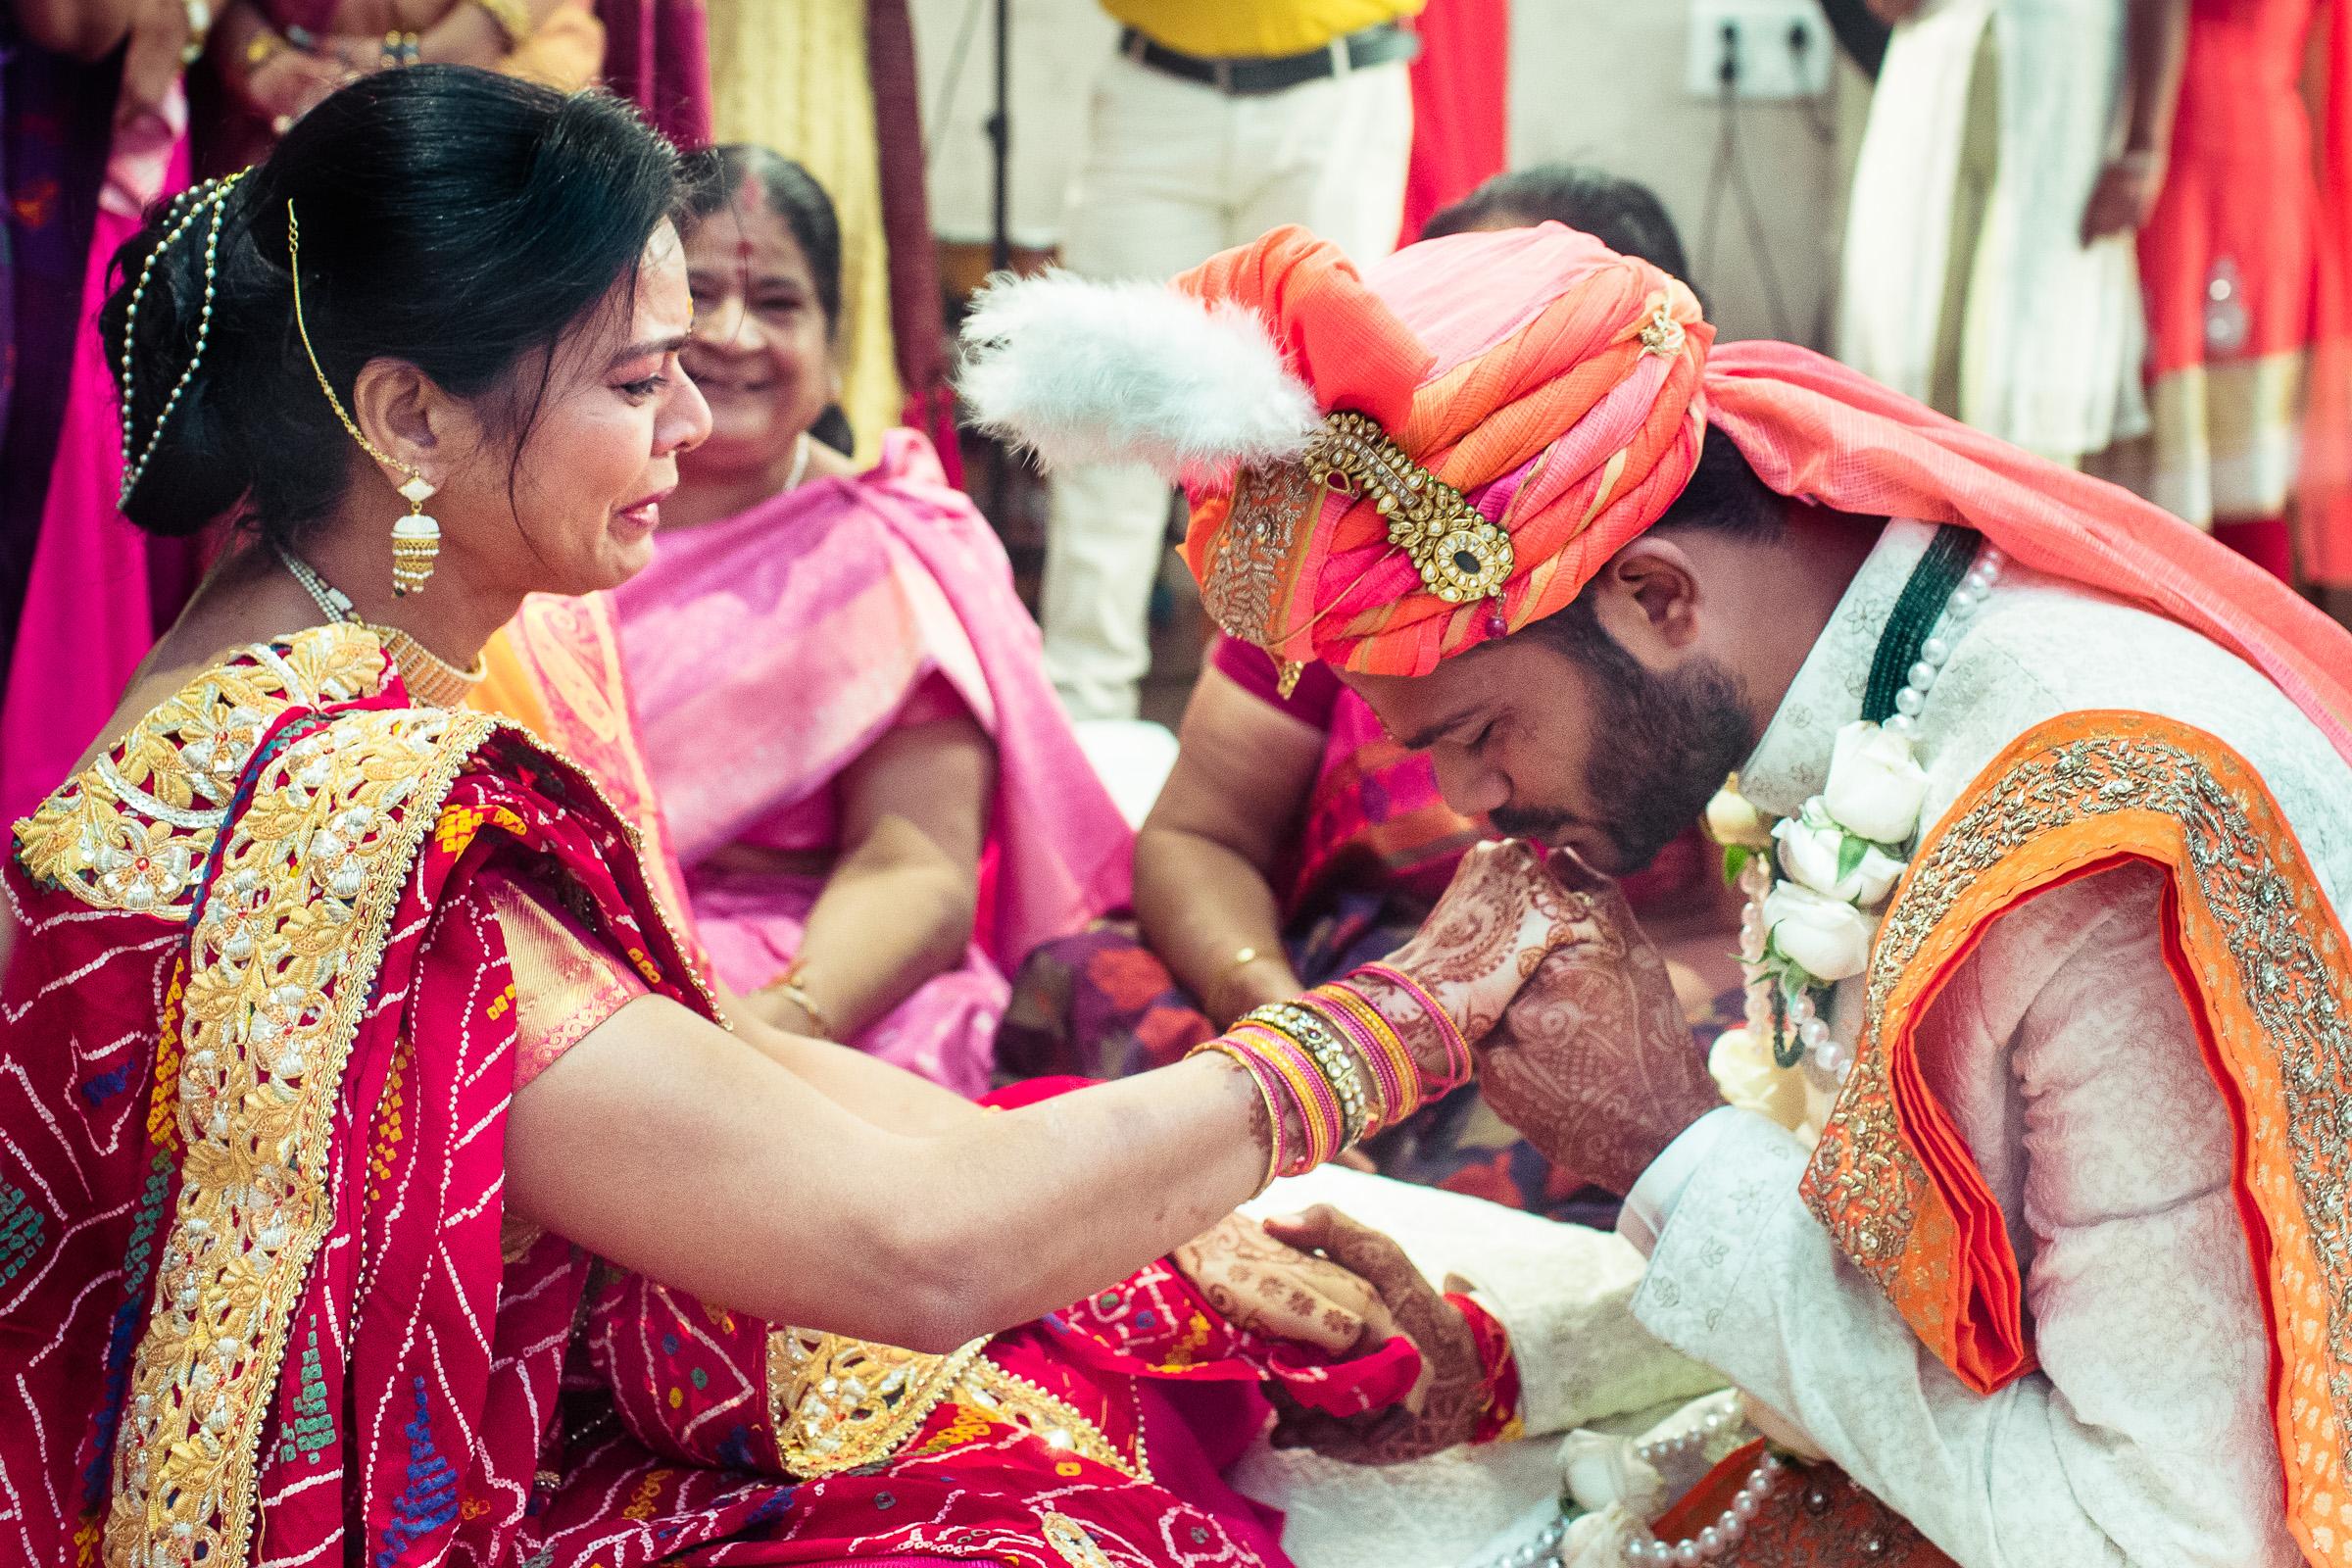 marwari-candid-wedding-photographers-bangalore-0015.jpg